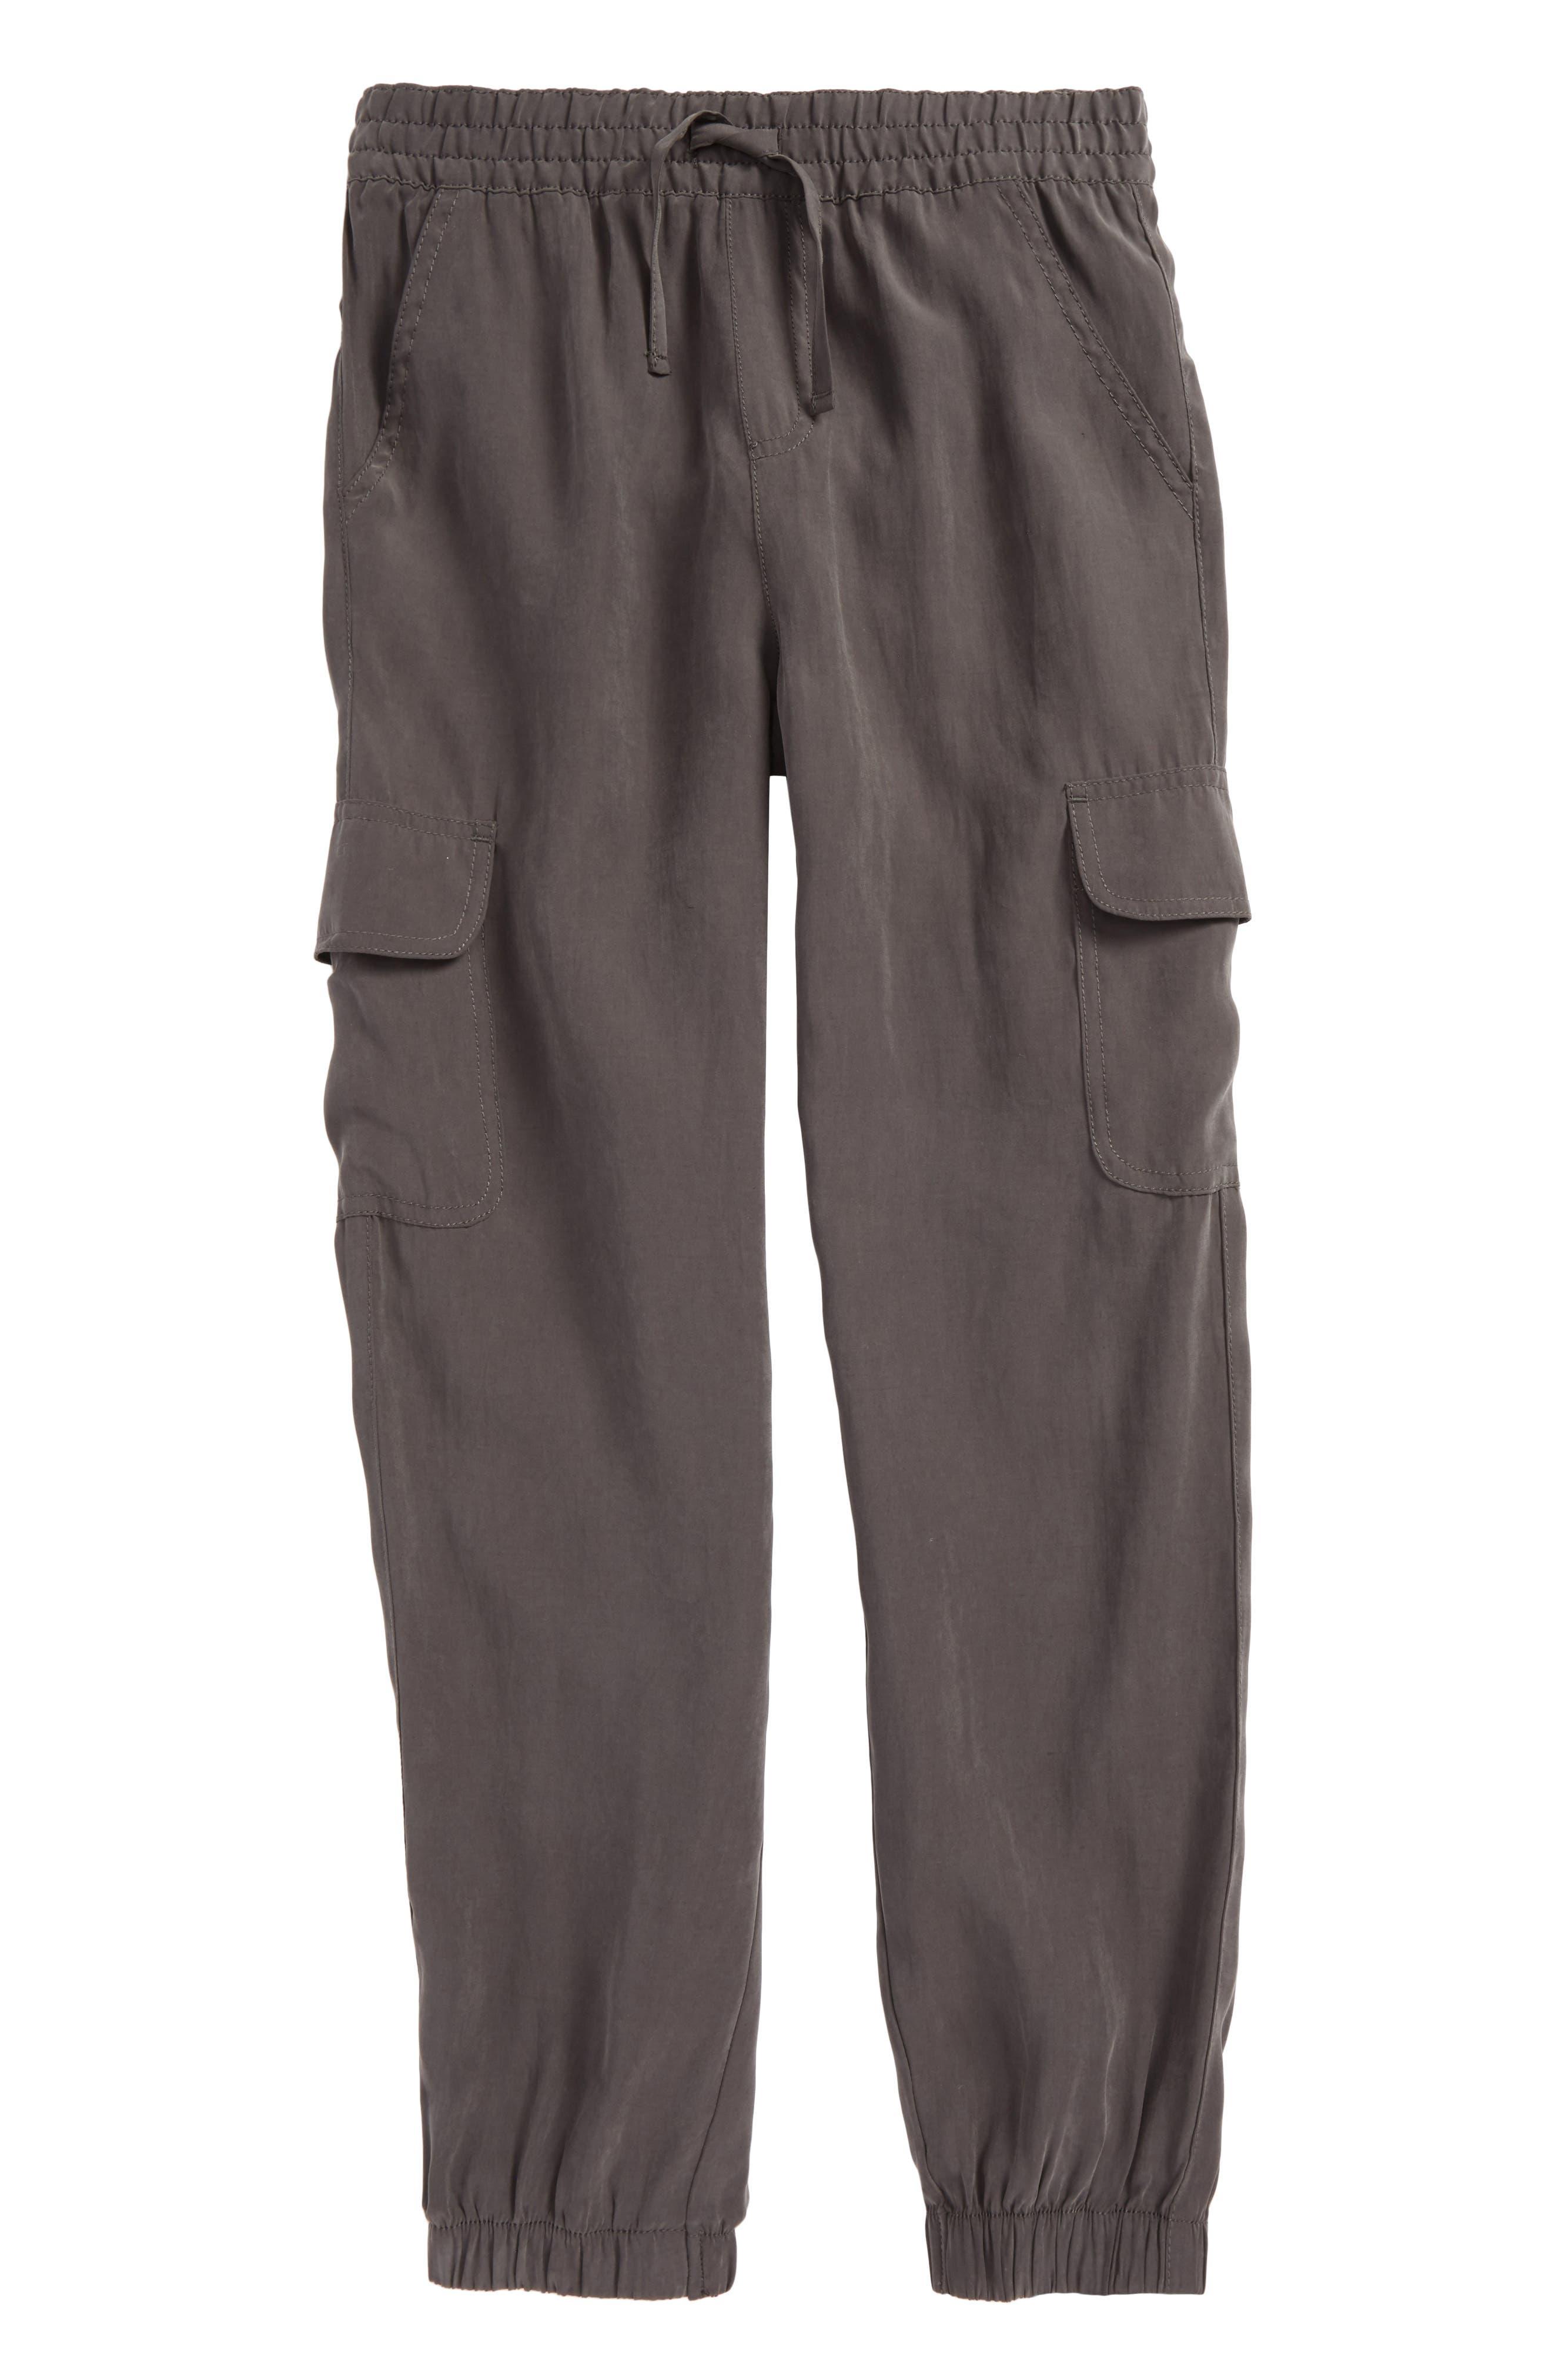 Cargo Jogging Pants,                         Main,                         color,